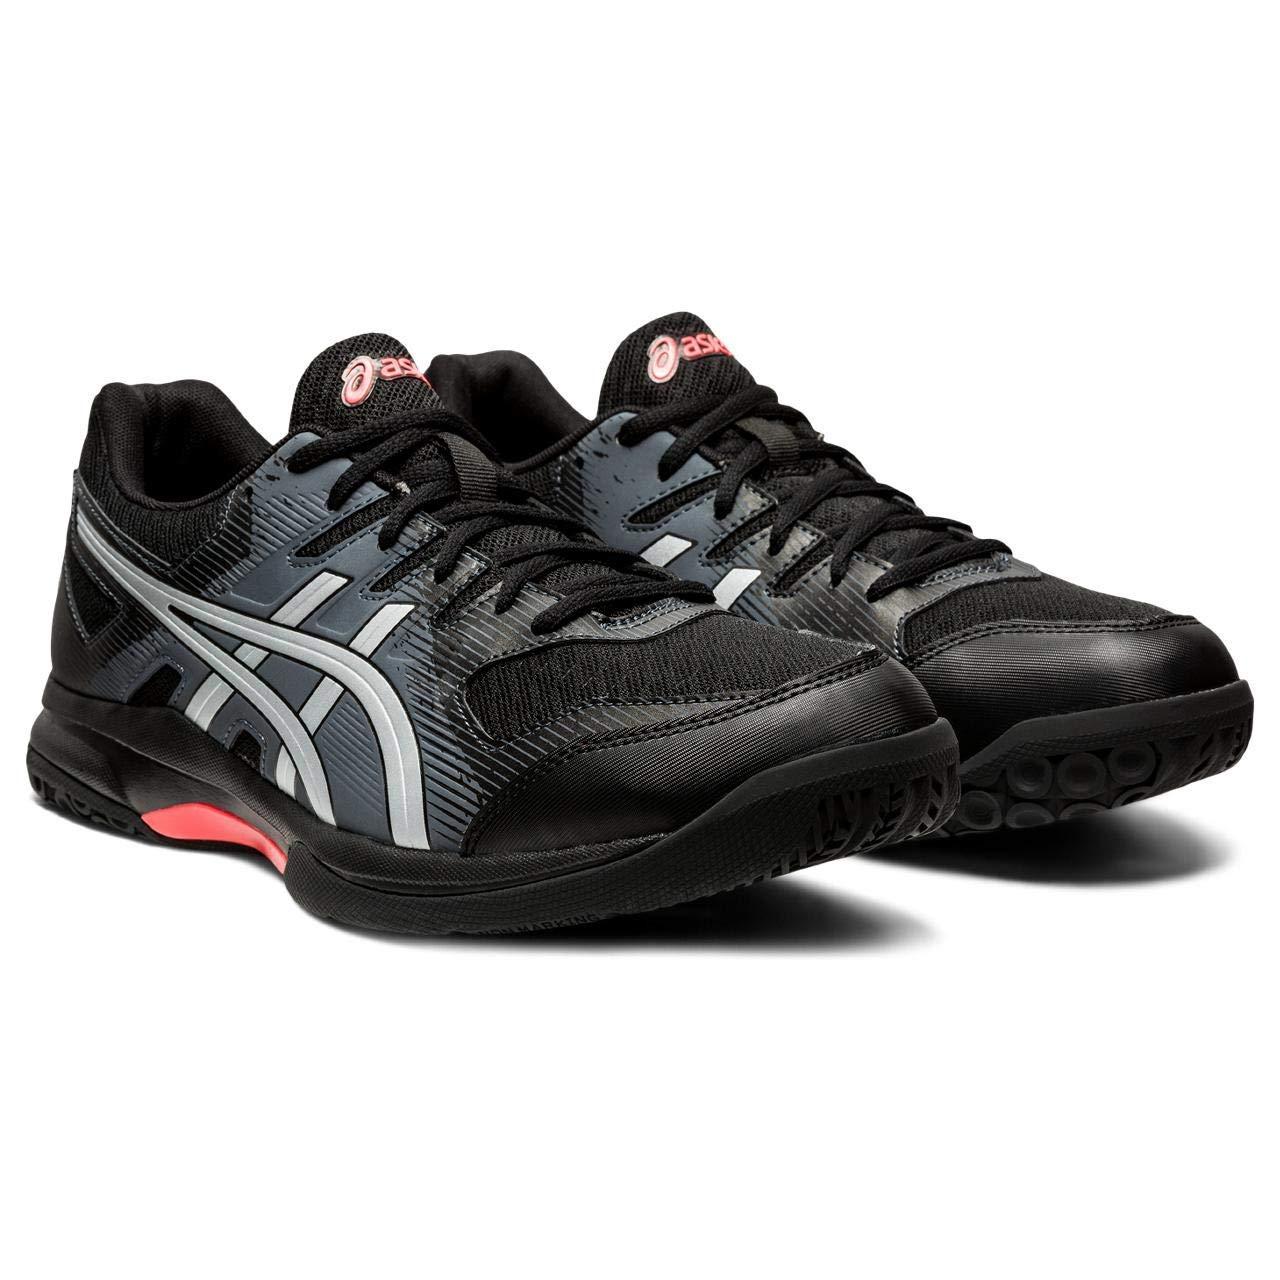 Asics Men S Gel Rocket 9 Volleyball Shoe Buy Online In Sri Lanka At Desertcart